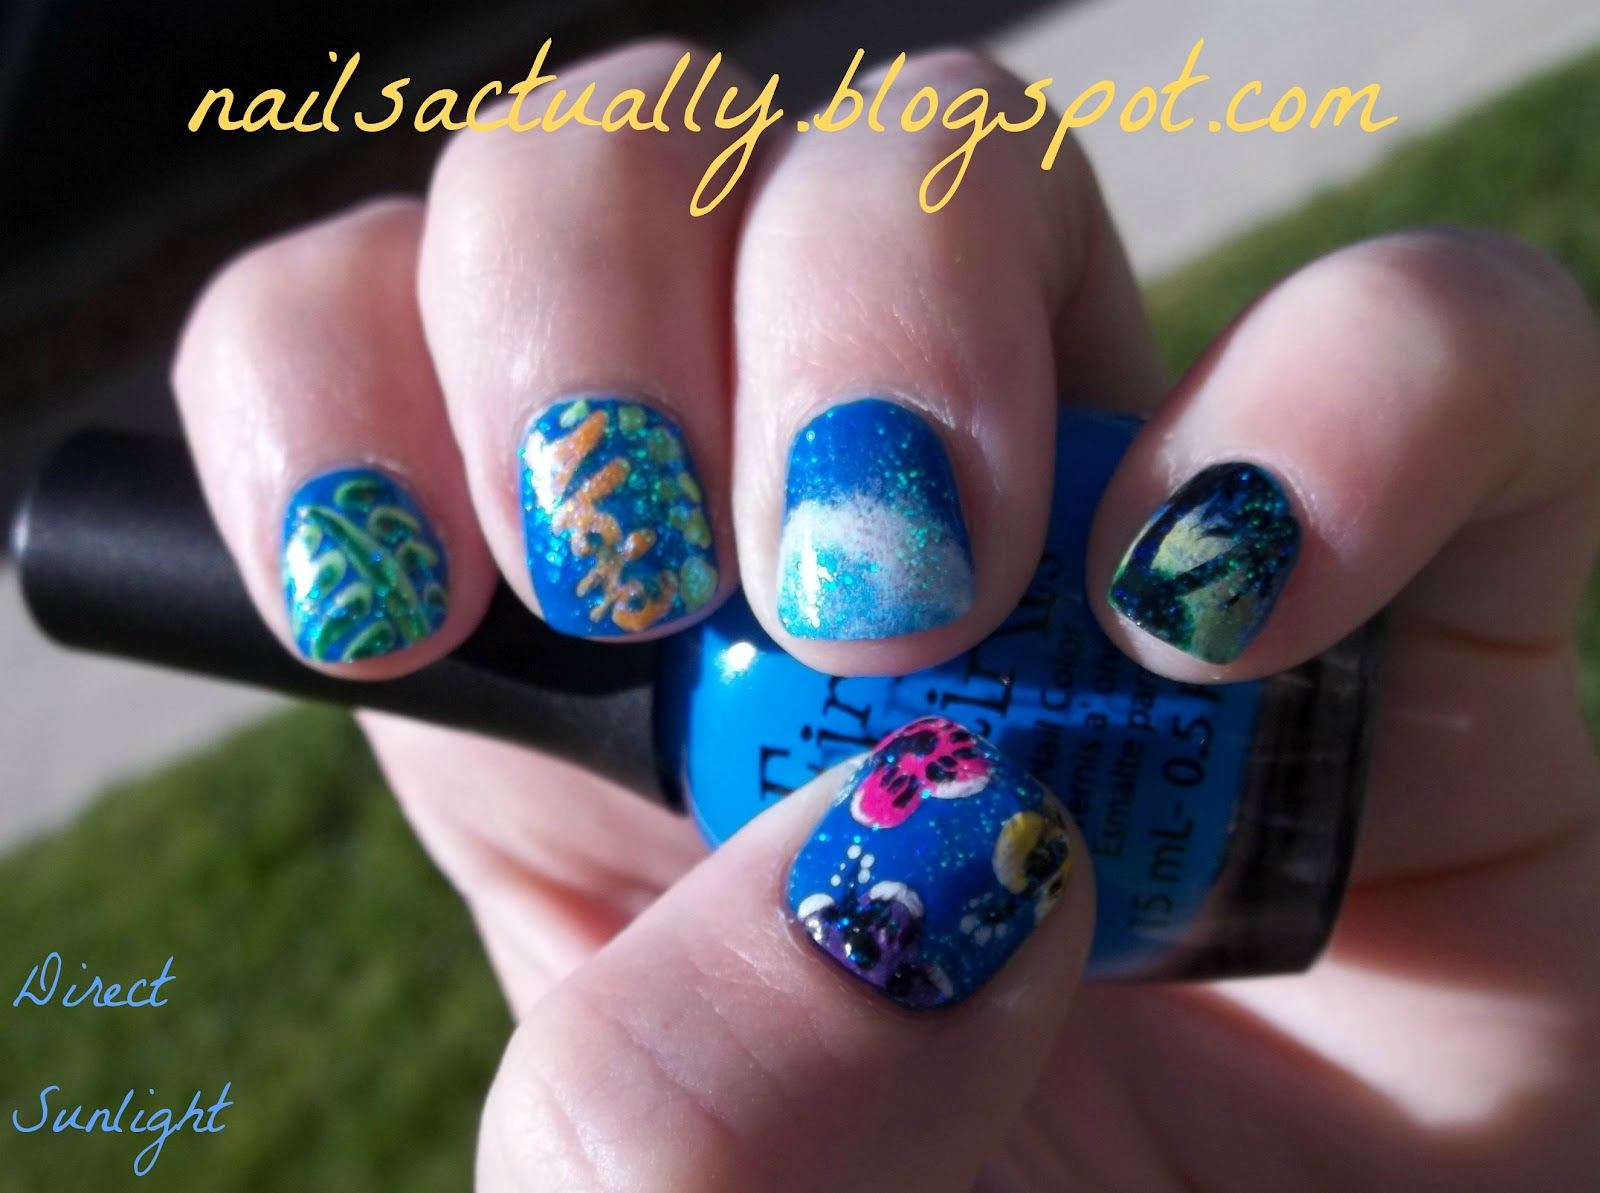 Nails Actually: Tropical Nails aka Hawaiian Nails for tonight\'s luau ...